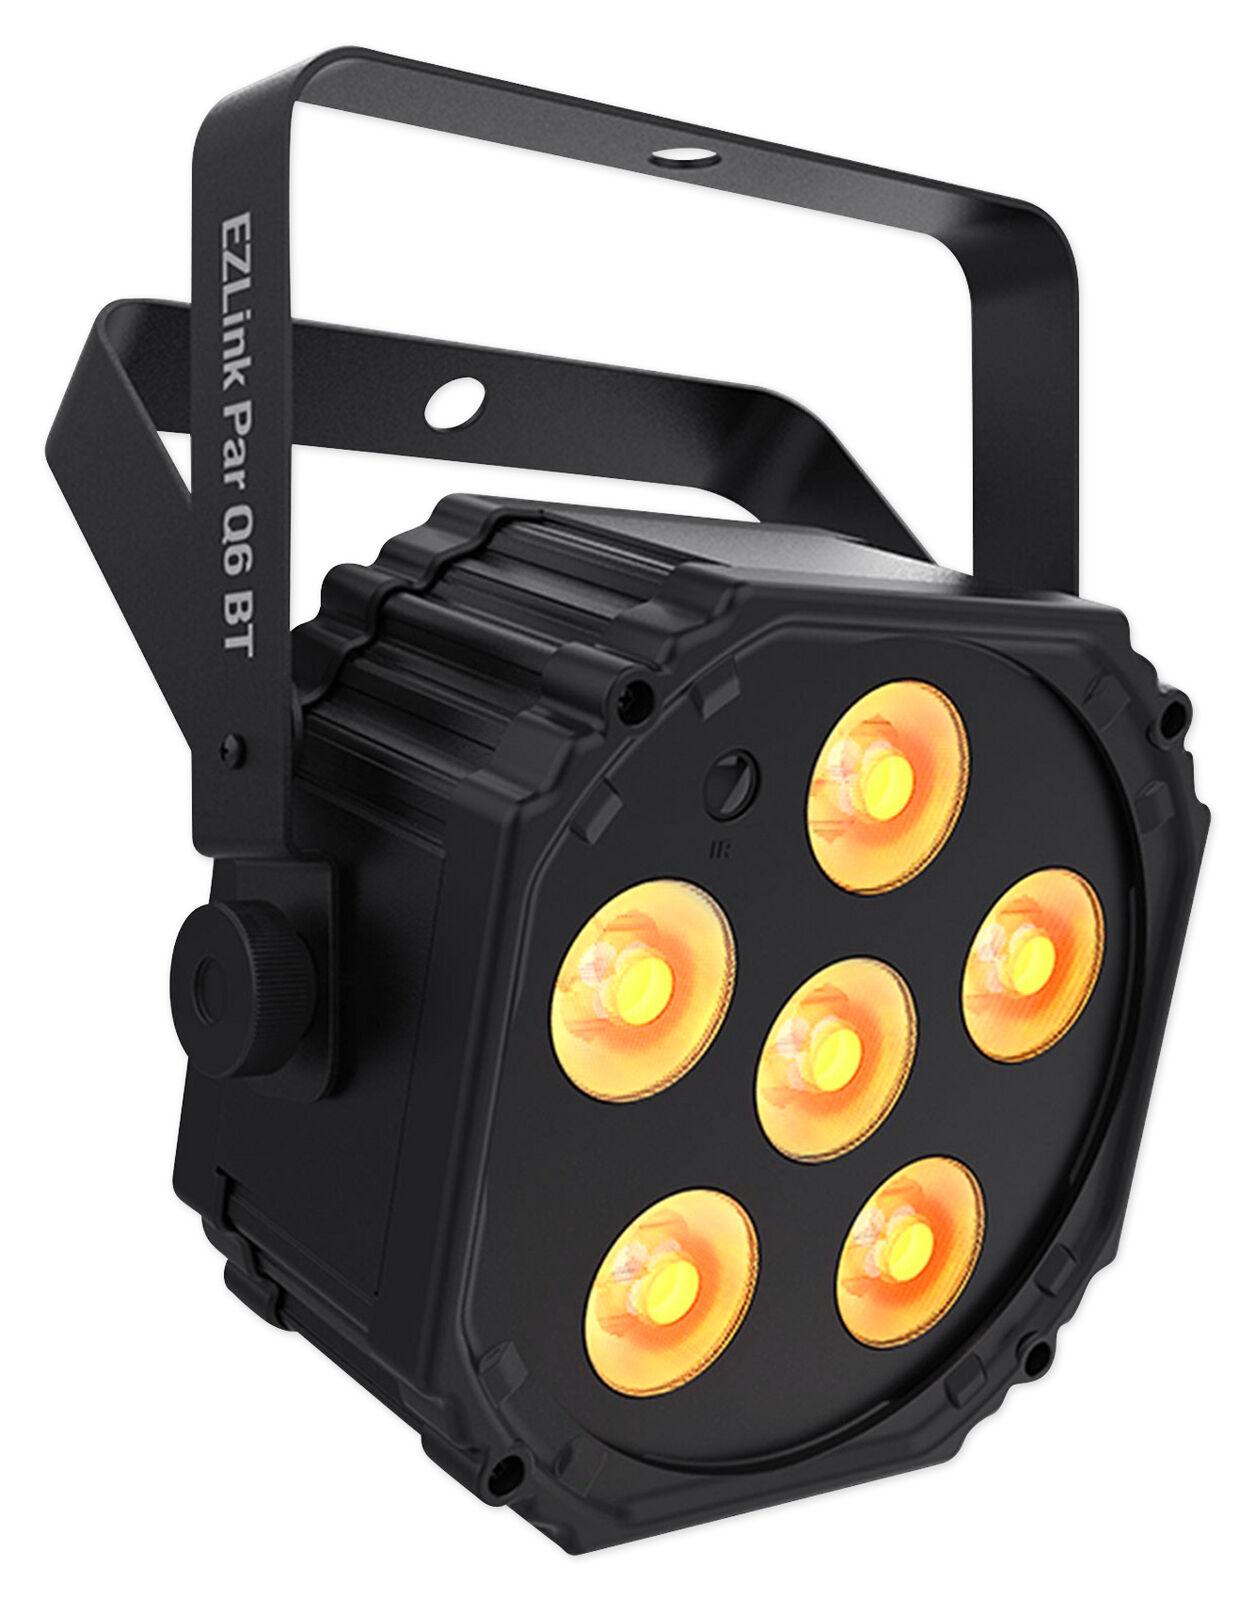 Chauvet DJ Ezlink Par Q6 BT Wireless Battery-Powered RGBA Bluetooth Wash Light